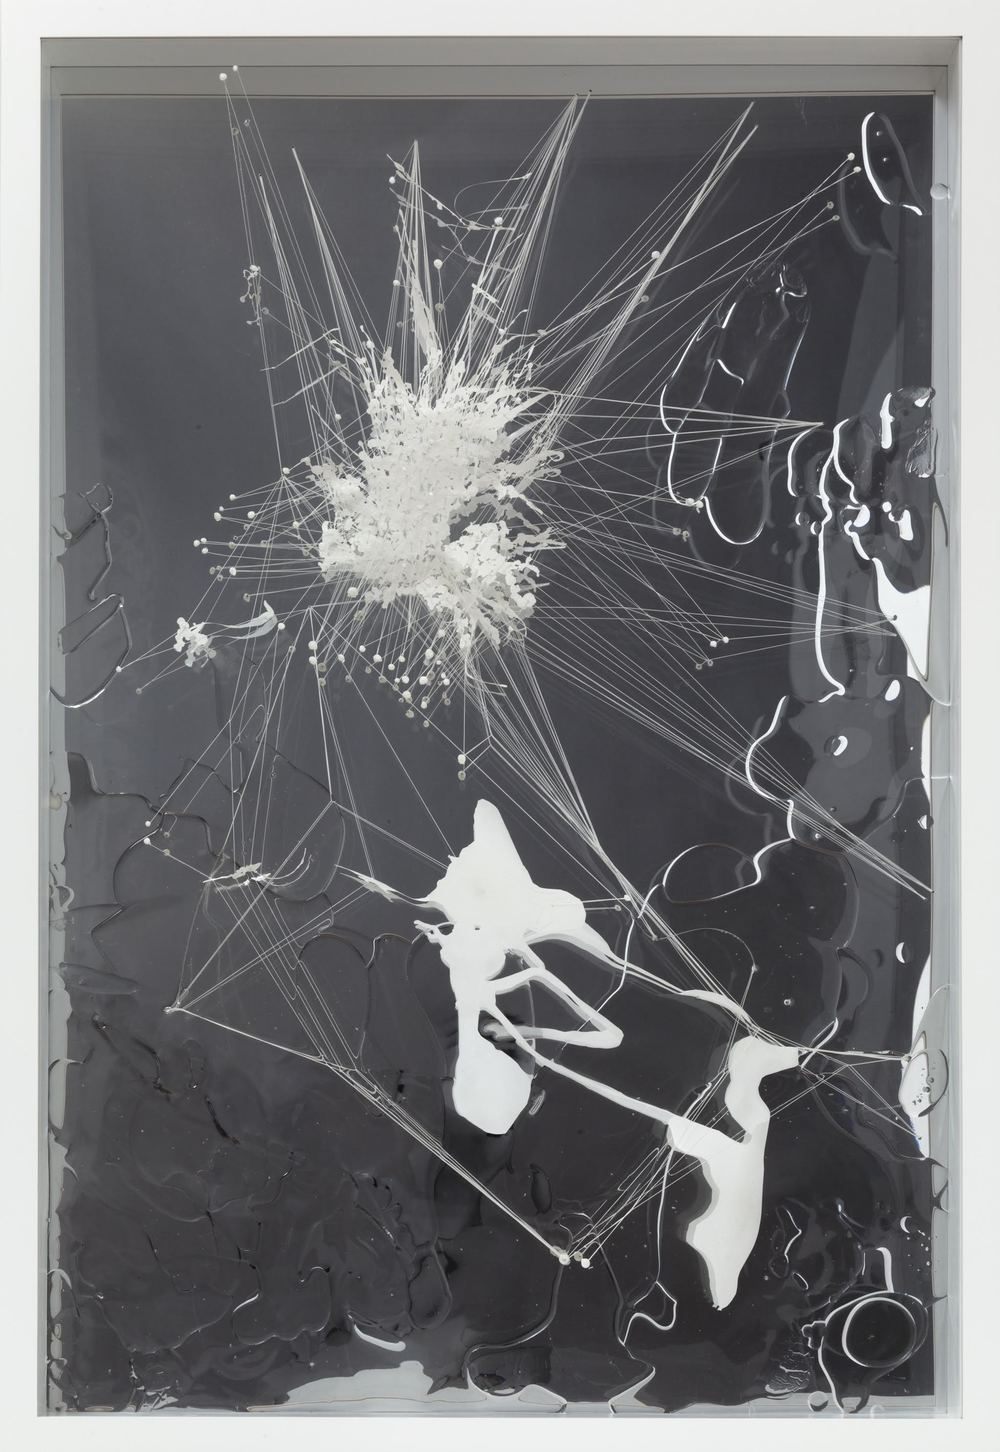 Stuck, 2010  Acrylic, mylar, thread, plexi-glass  50 x 34 inches